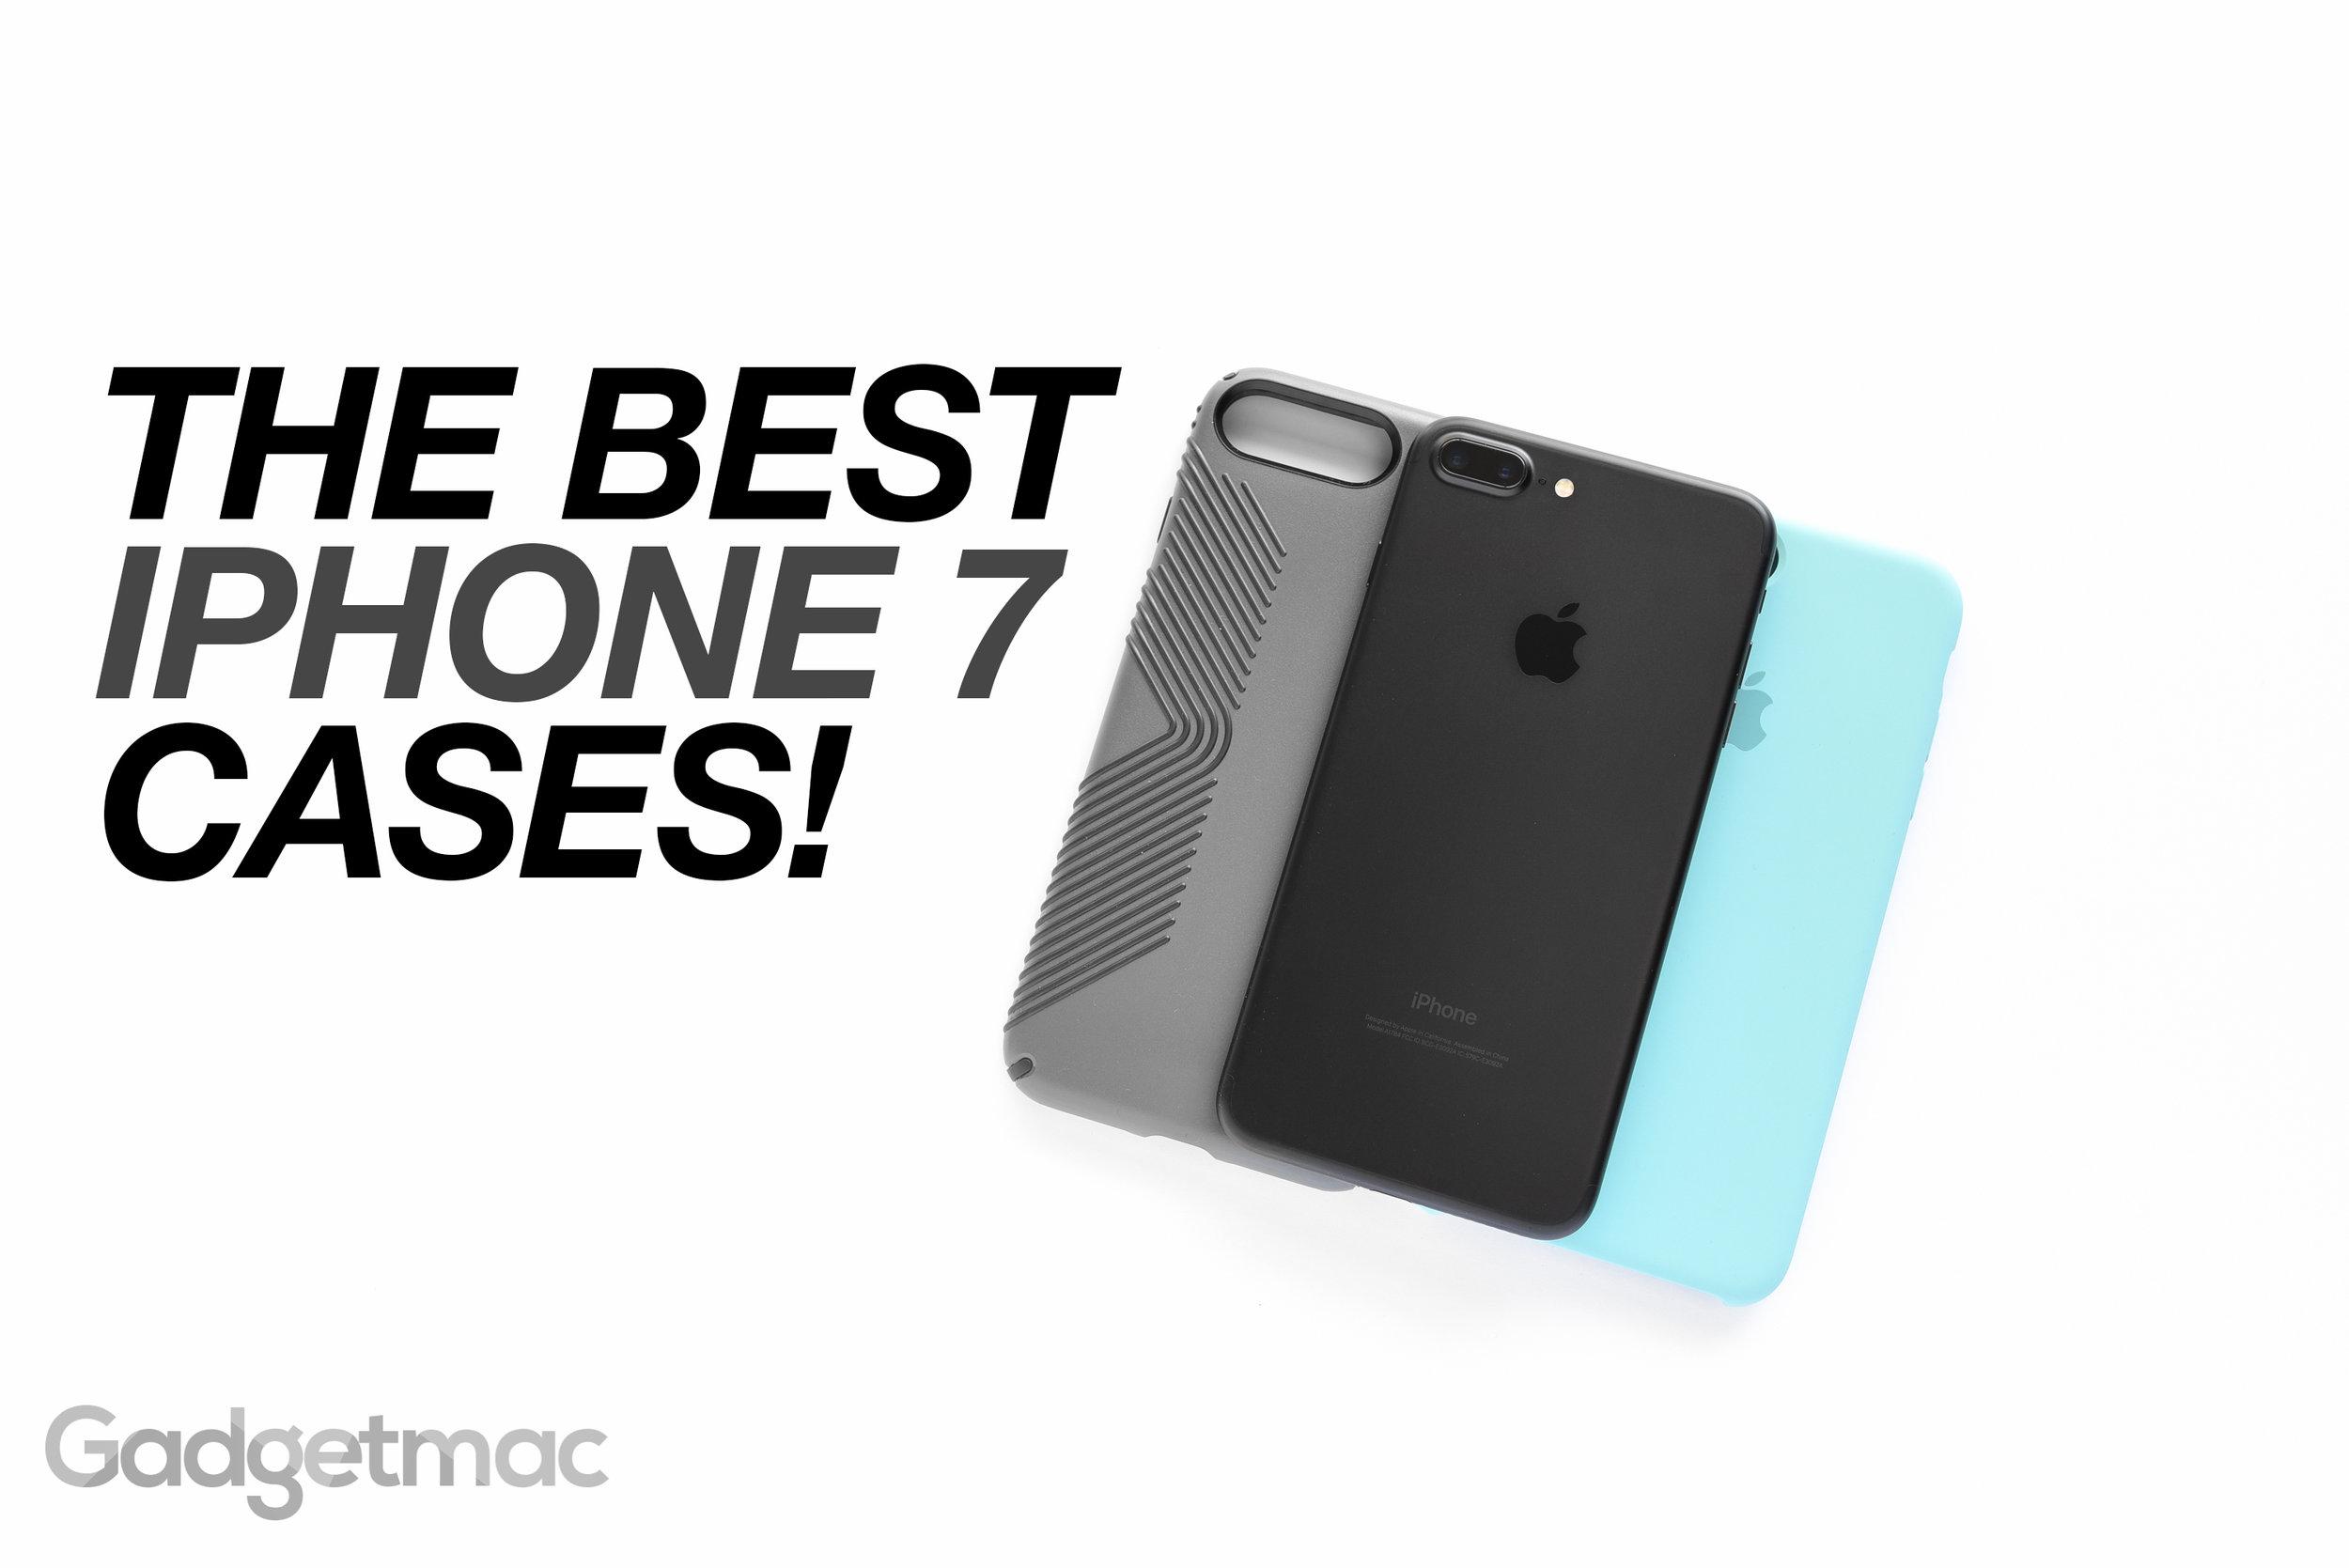 best-iphone-7-cases-hero.jpg